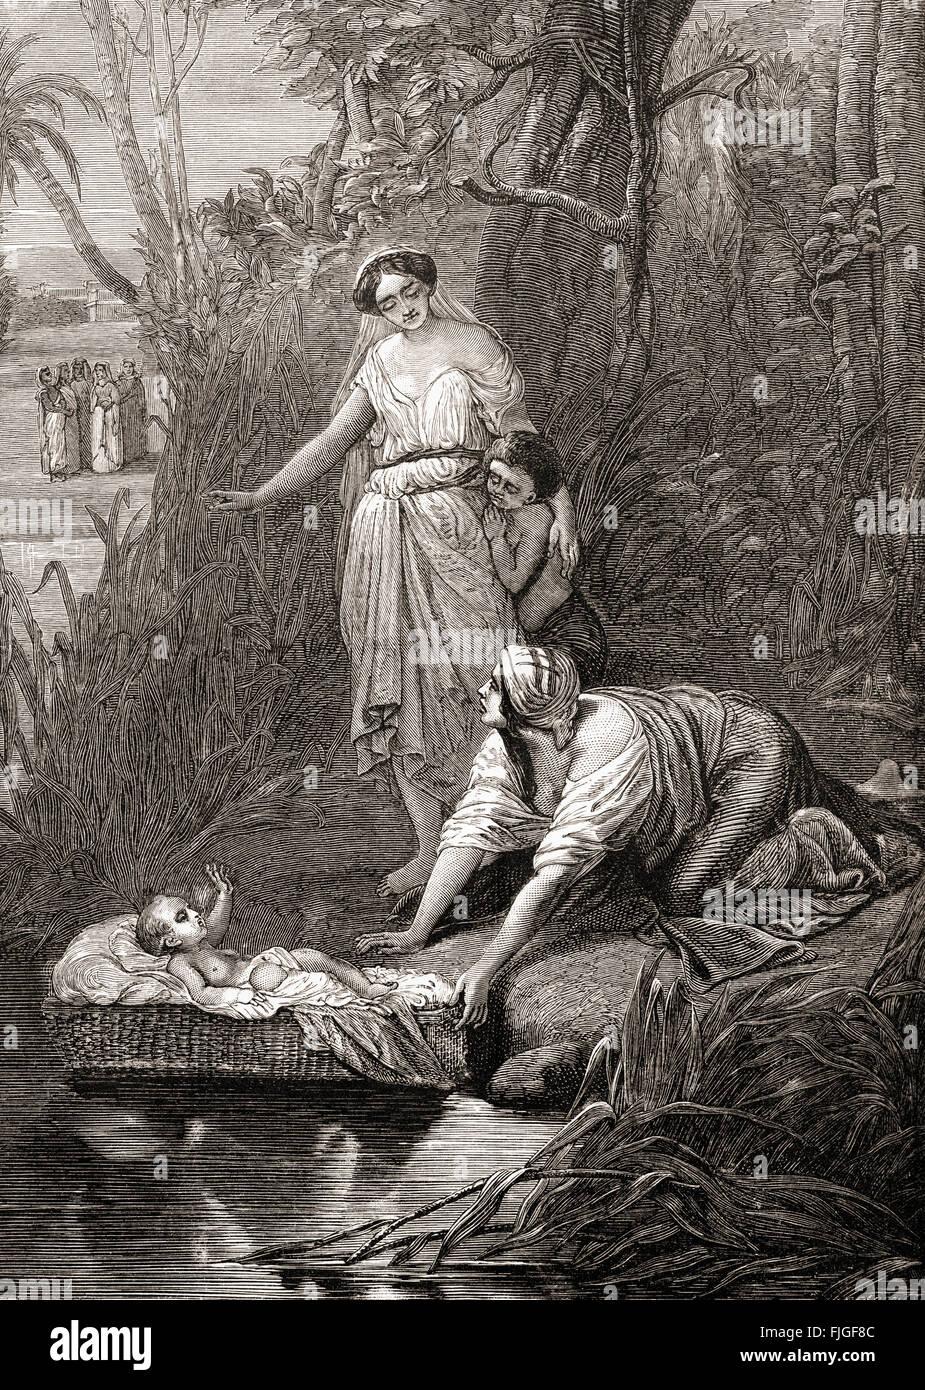 Moses and pharaoh s daughter interesting